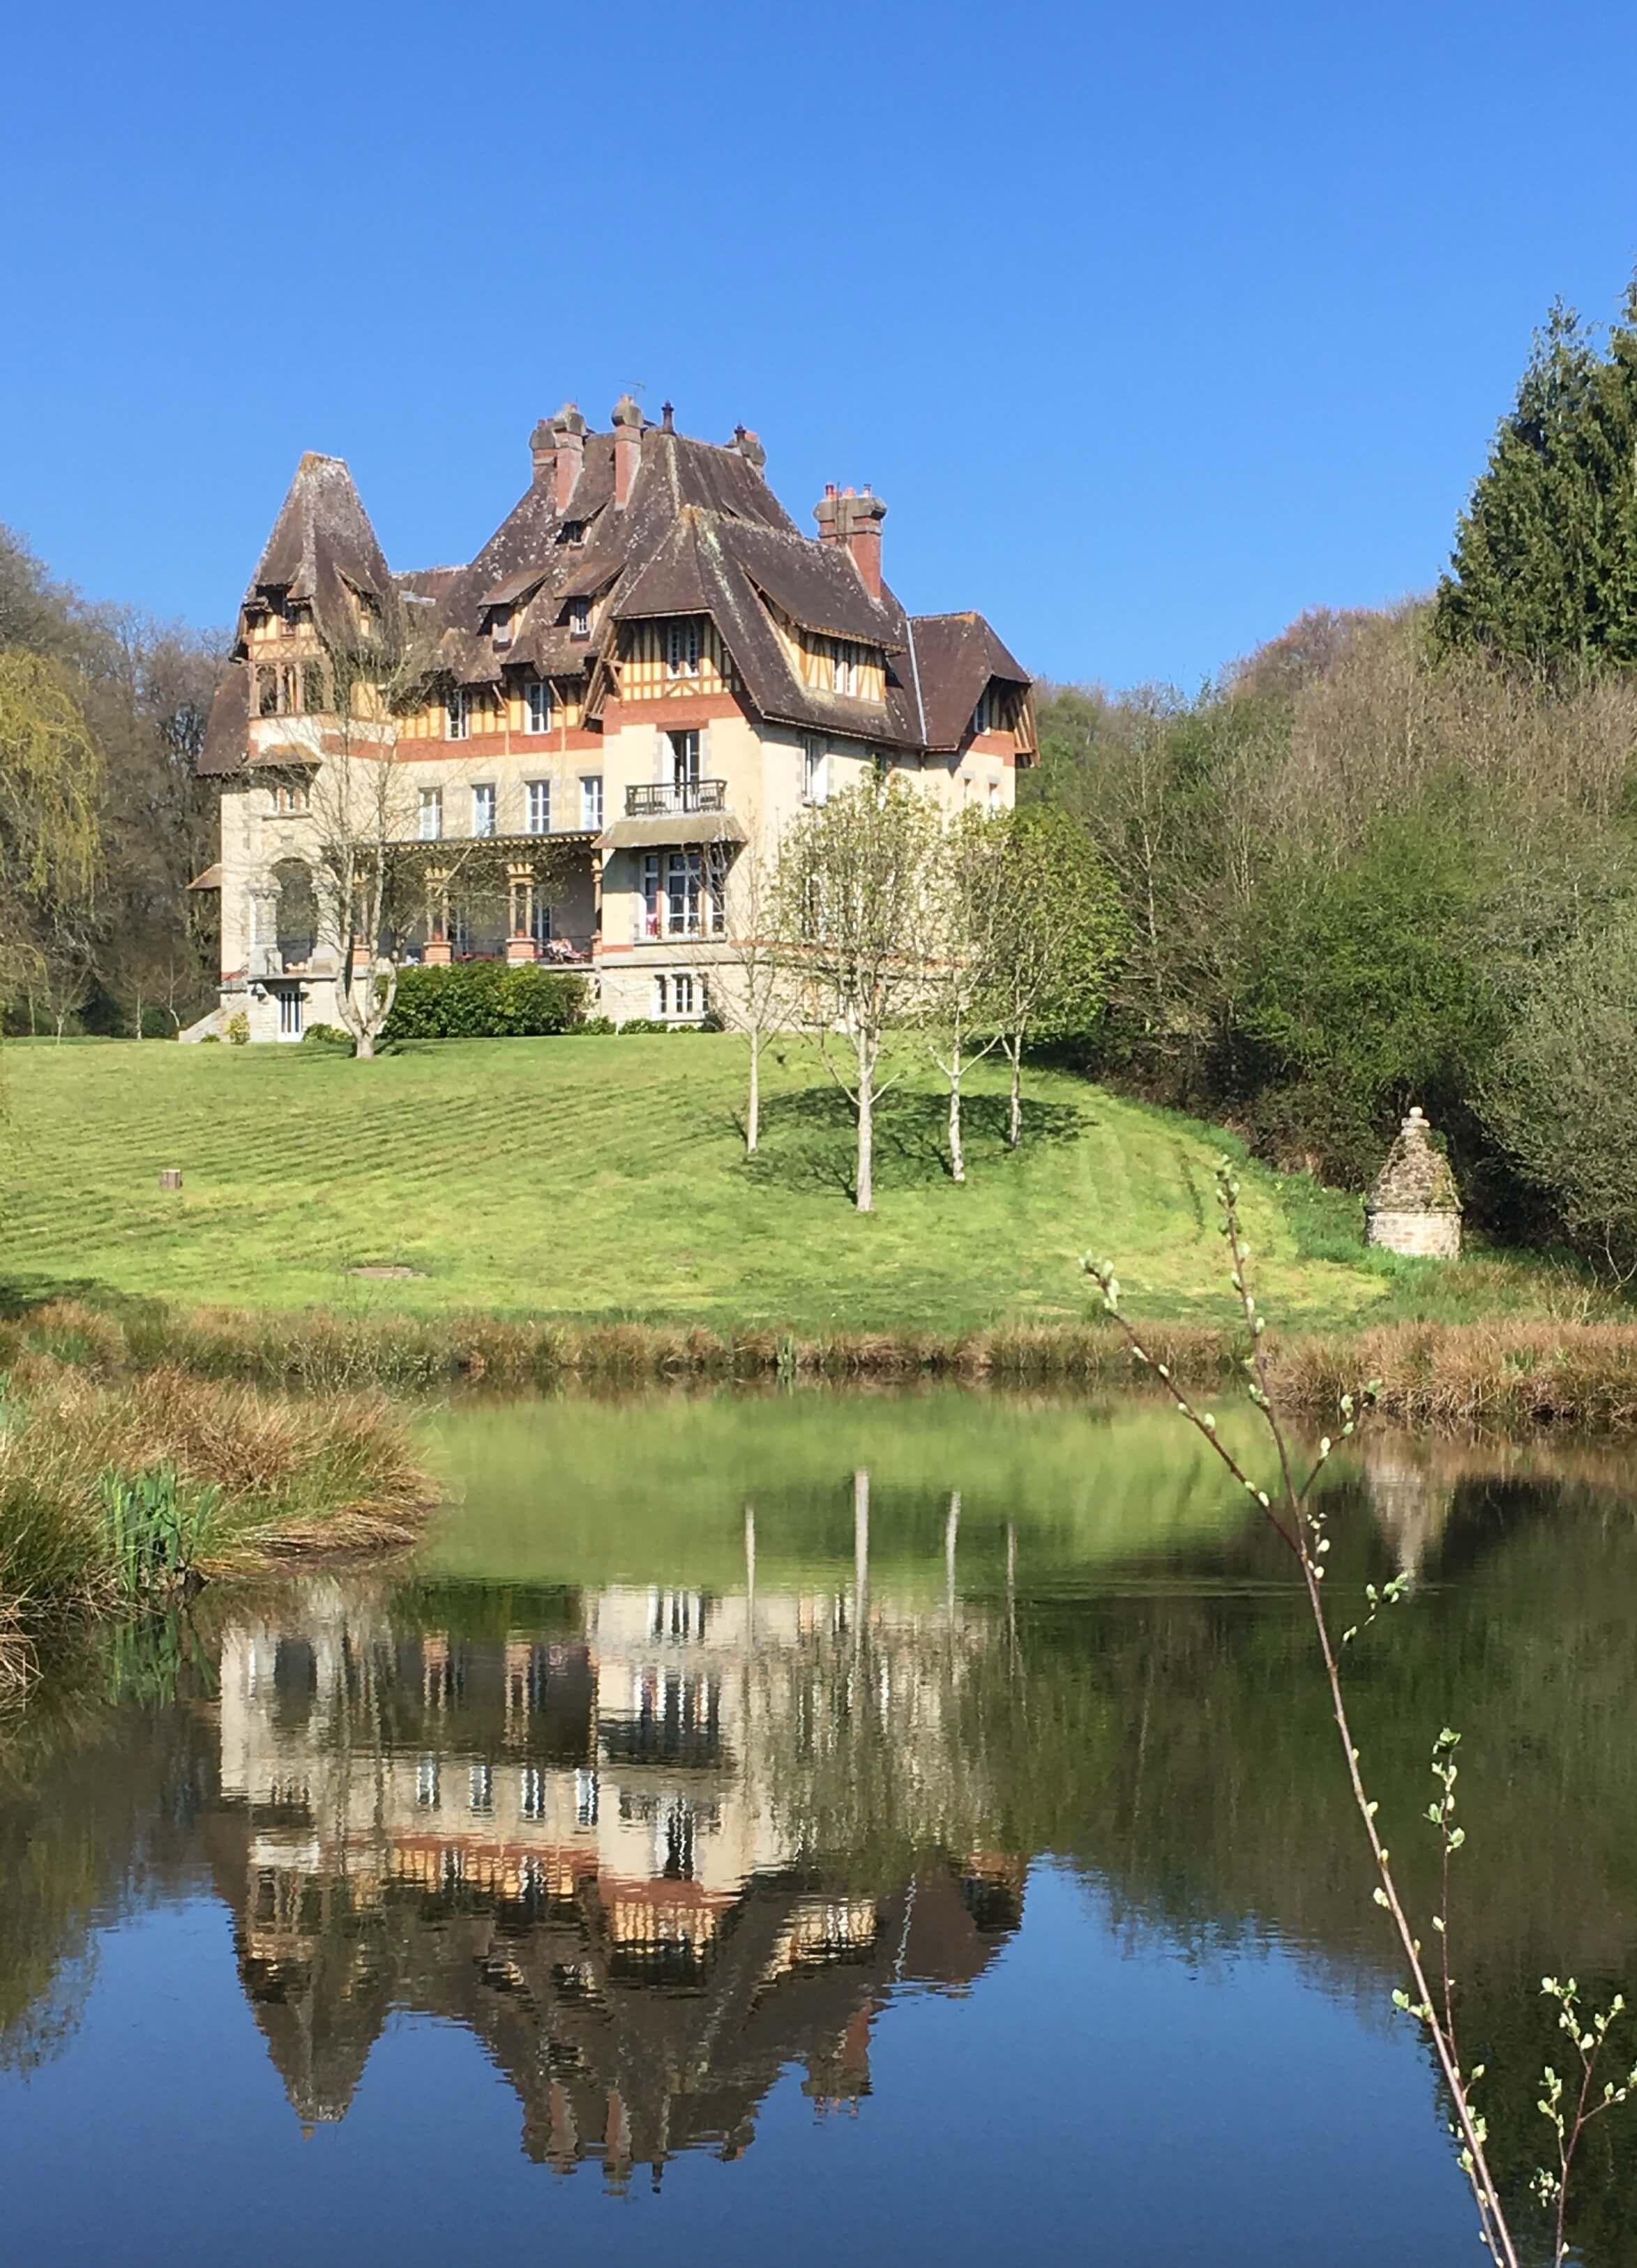 "<img  src=""/app/chateau2/assets/chateau_outside/A7C8BC94-5816-47B3-9989-C9F3737DEA75.jpeg?v=1624279667"">"